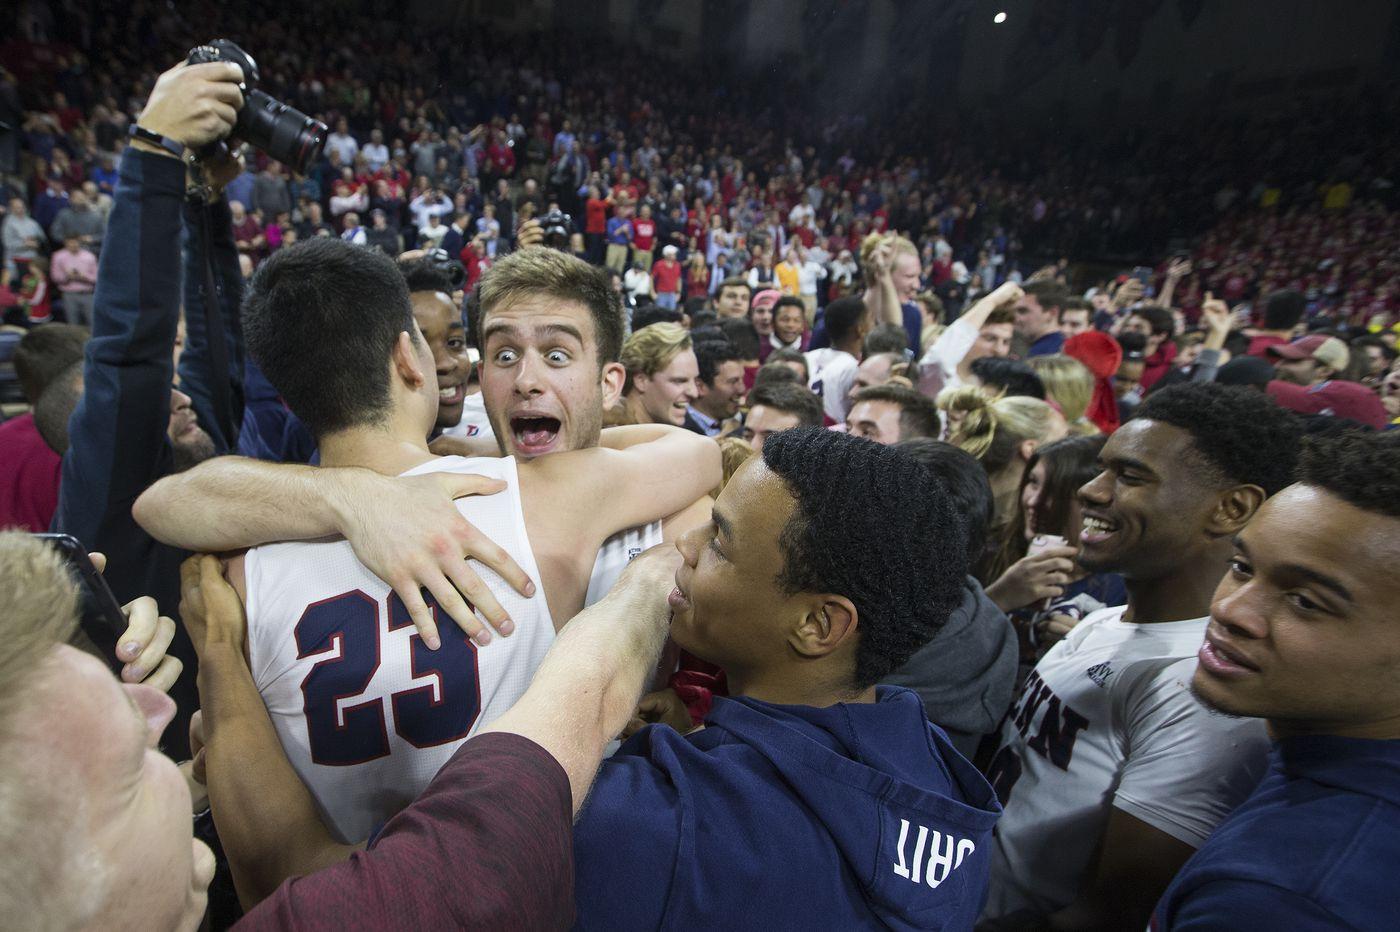 Penn basketball snaps Villanova's Big 5 streak, wins, 78-75, in a Palestra classic